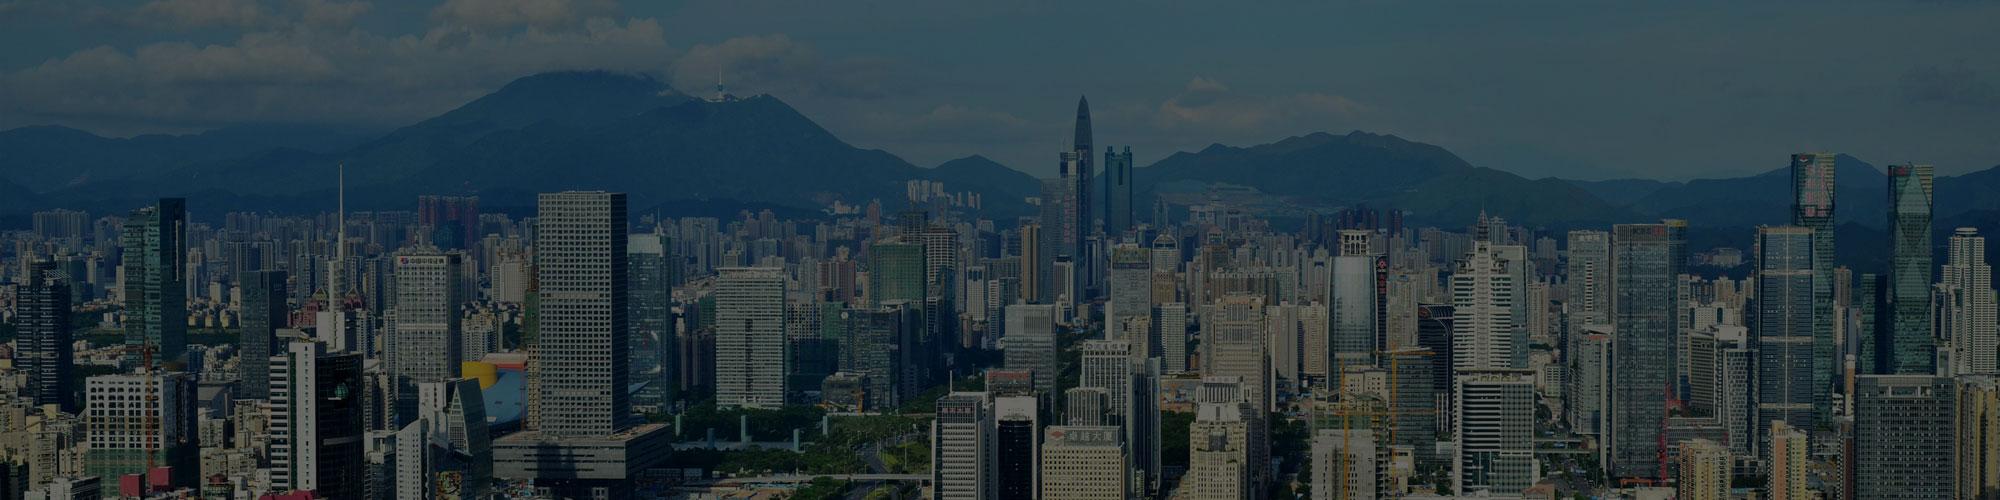 Future cities: Shenzhen